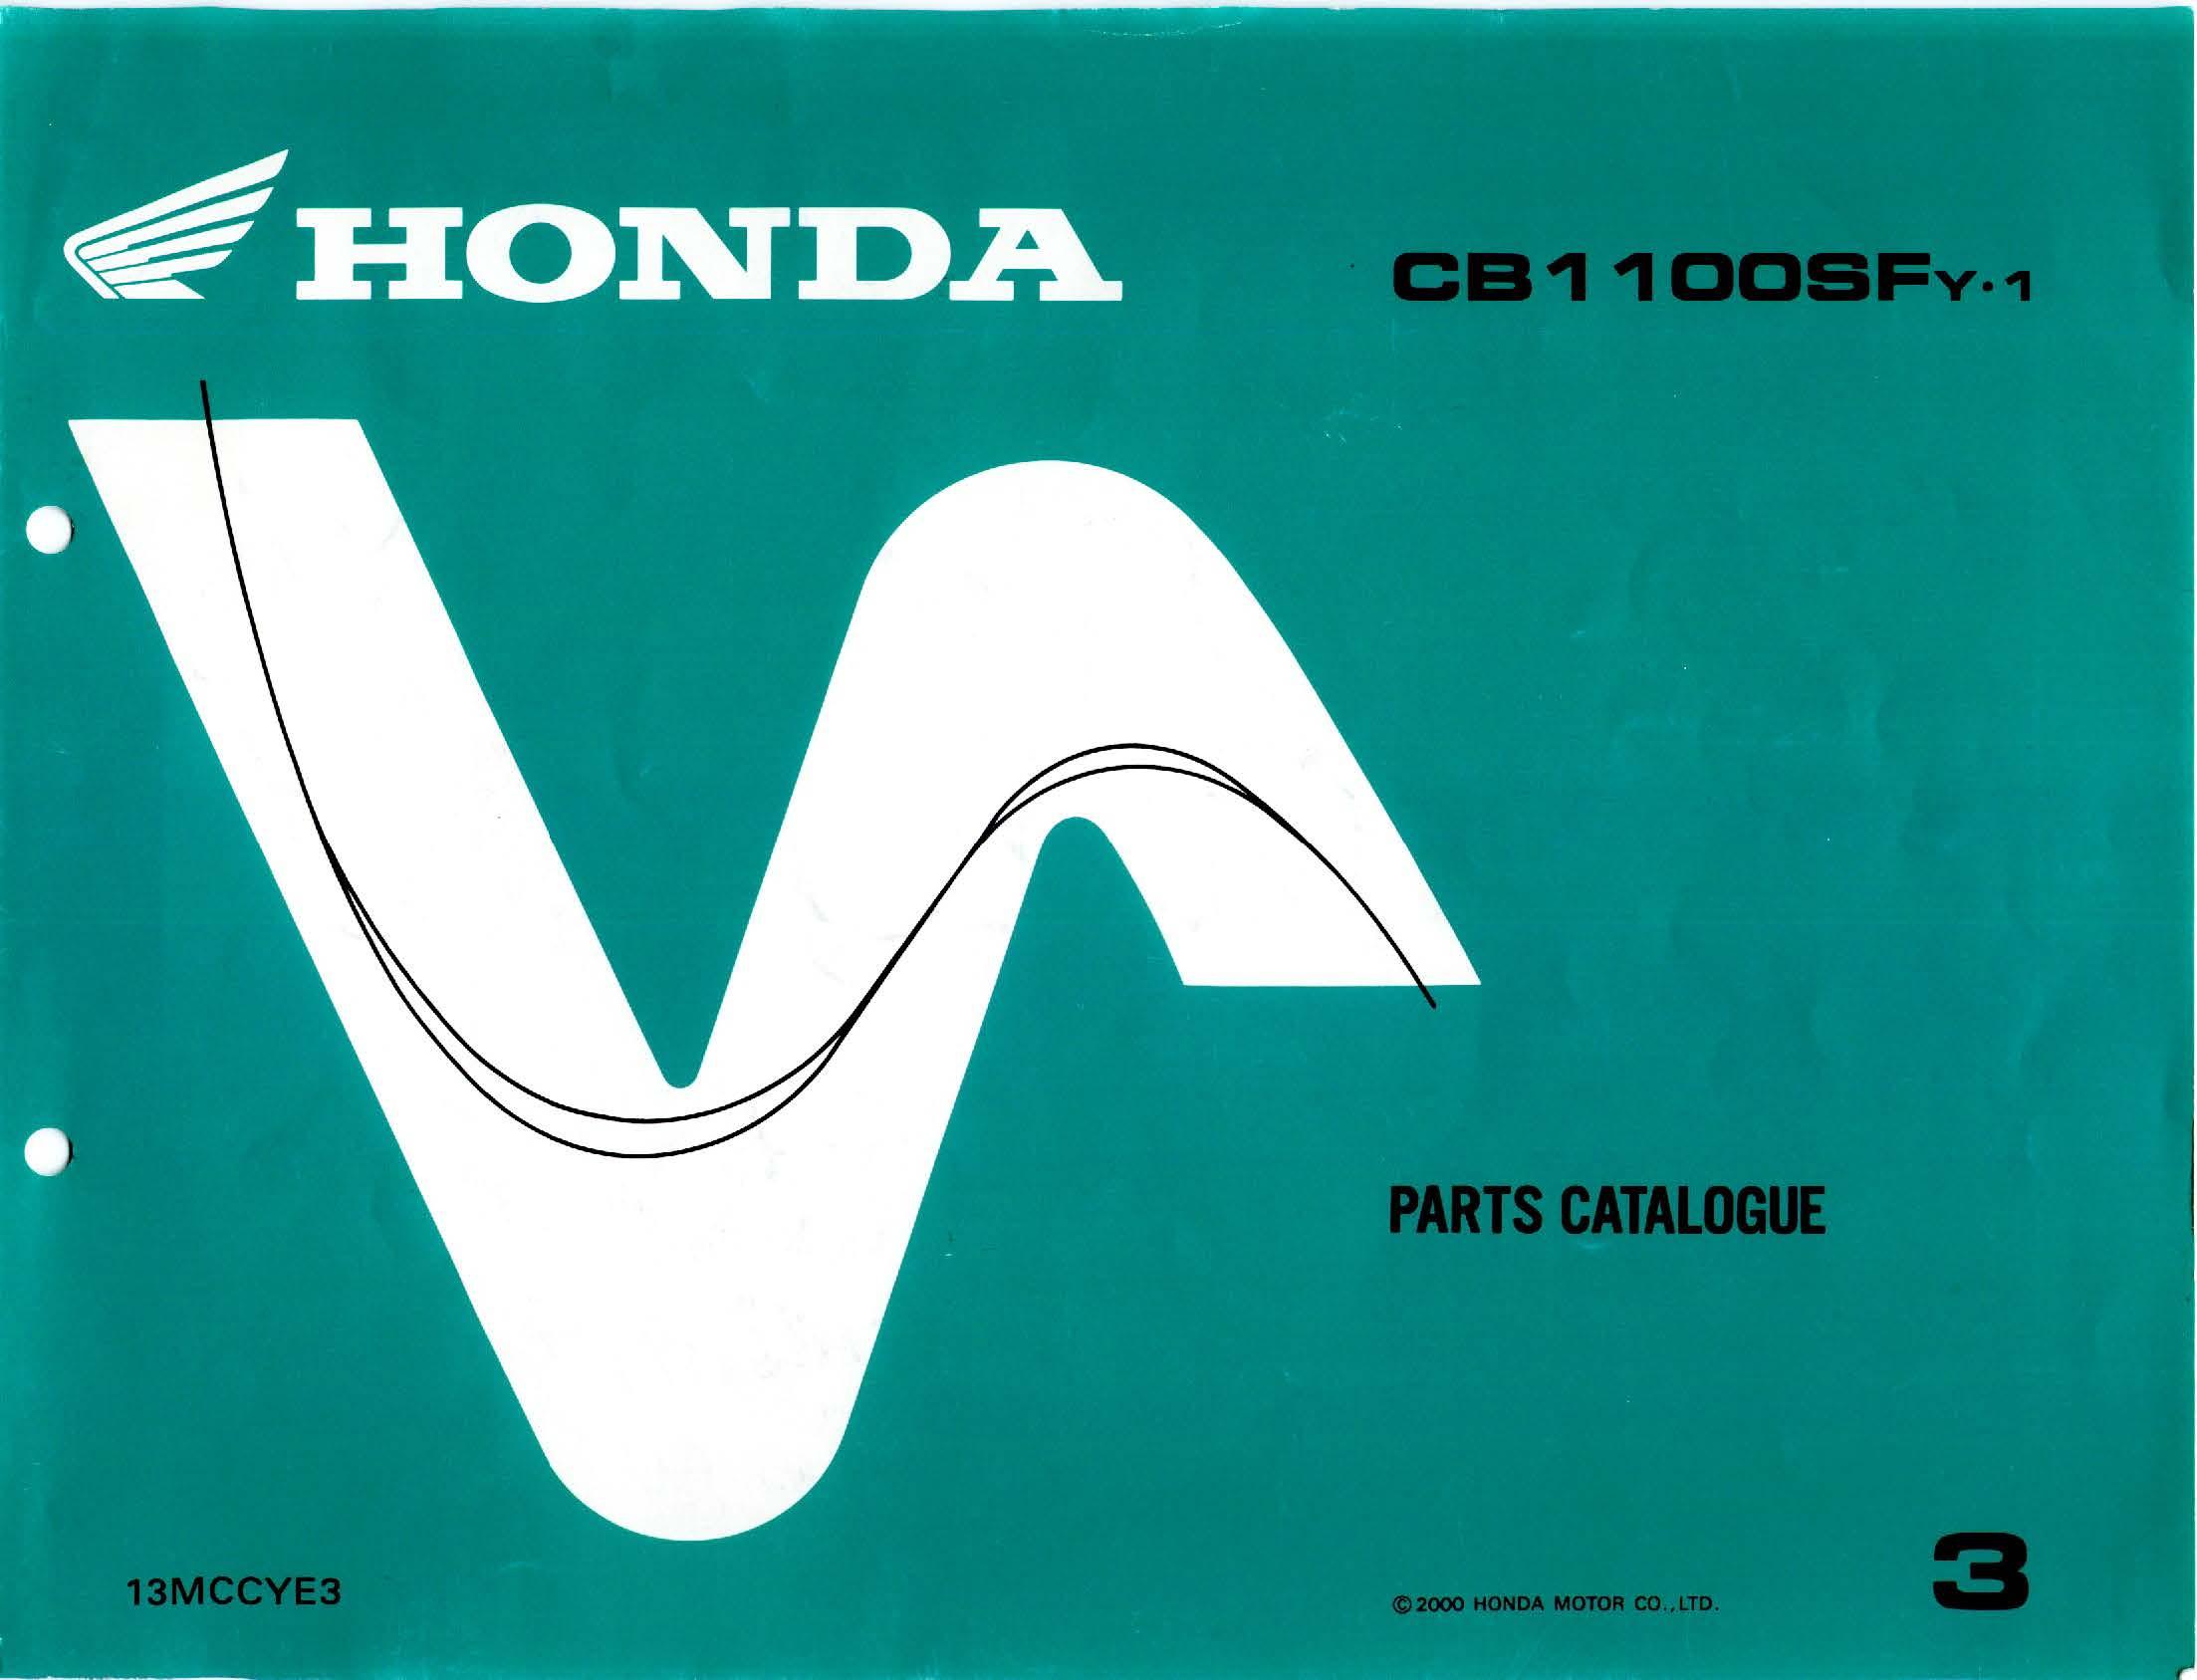 Parts list for Honda CB1100SF (2000)